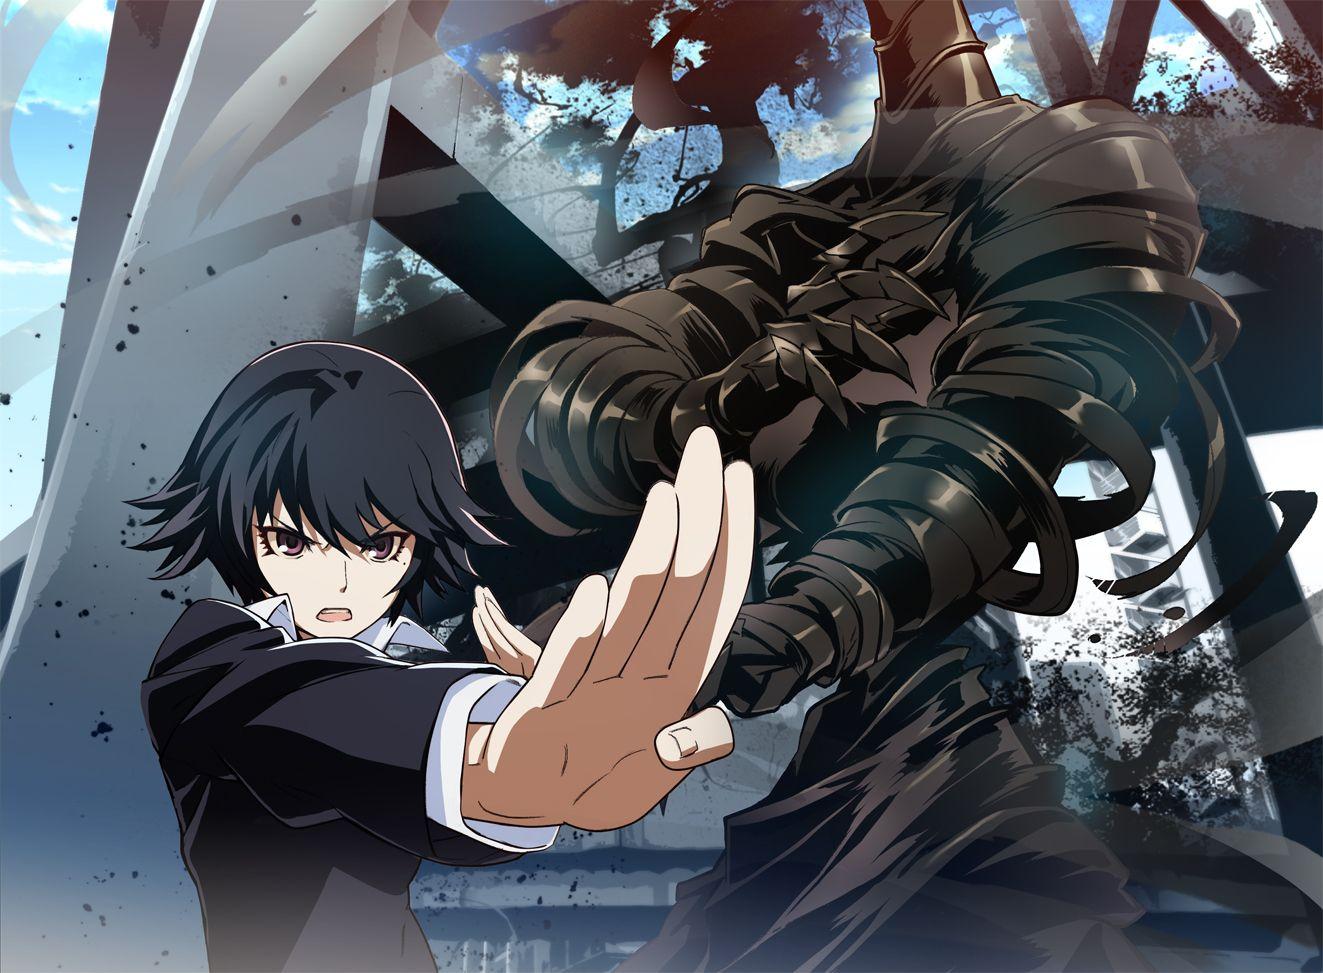 Pin by K♥ on Ajin Ajin anime, Anime, Anime wallpaper